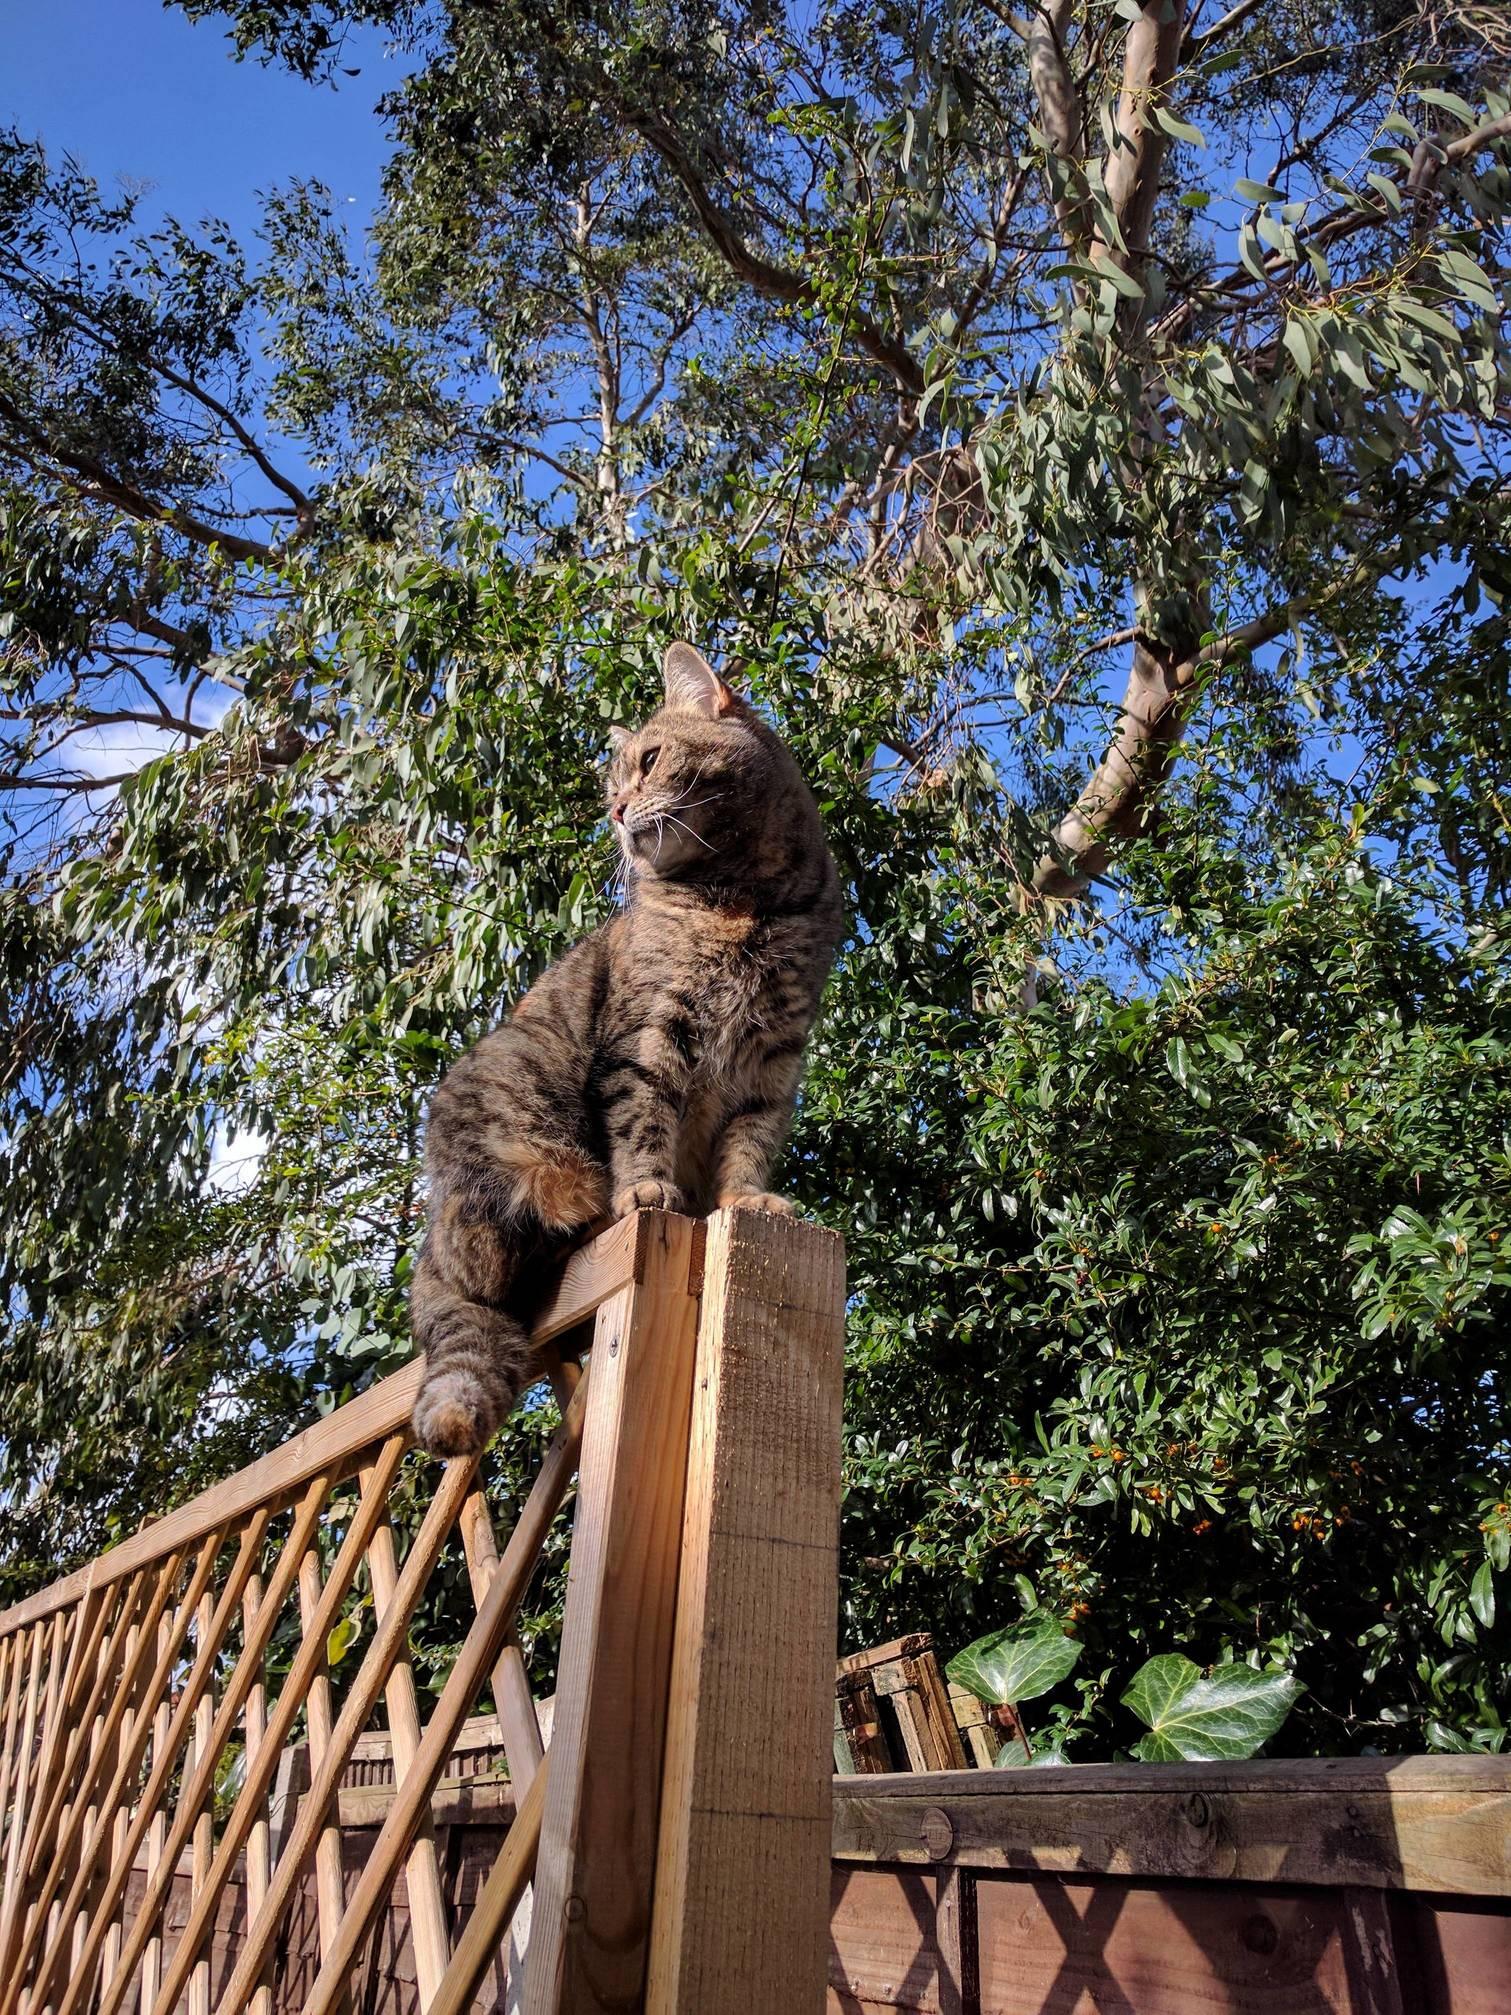 Leela climbs the trellis